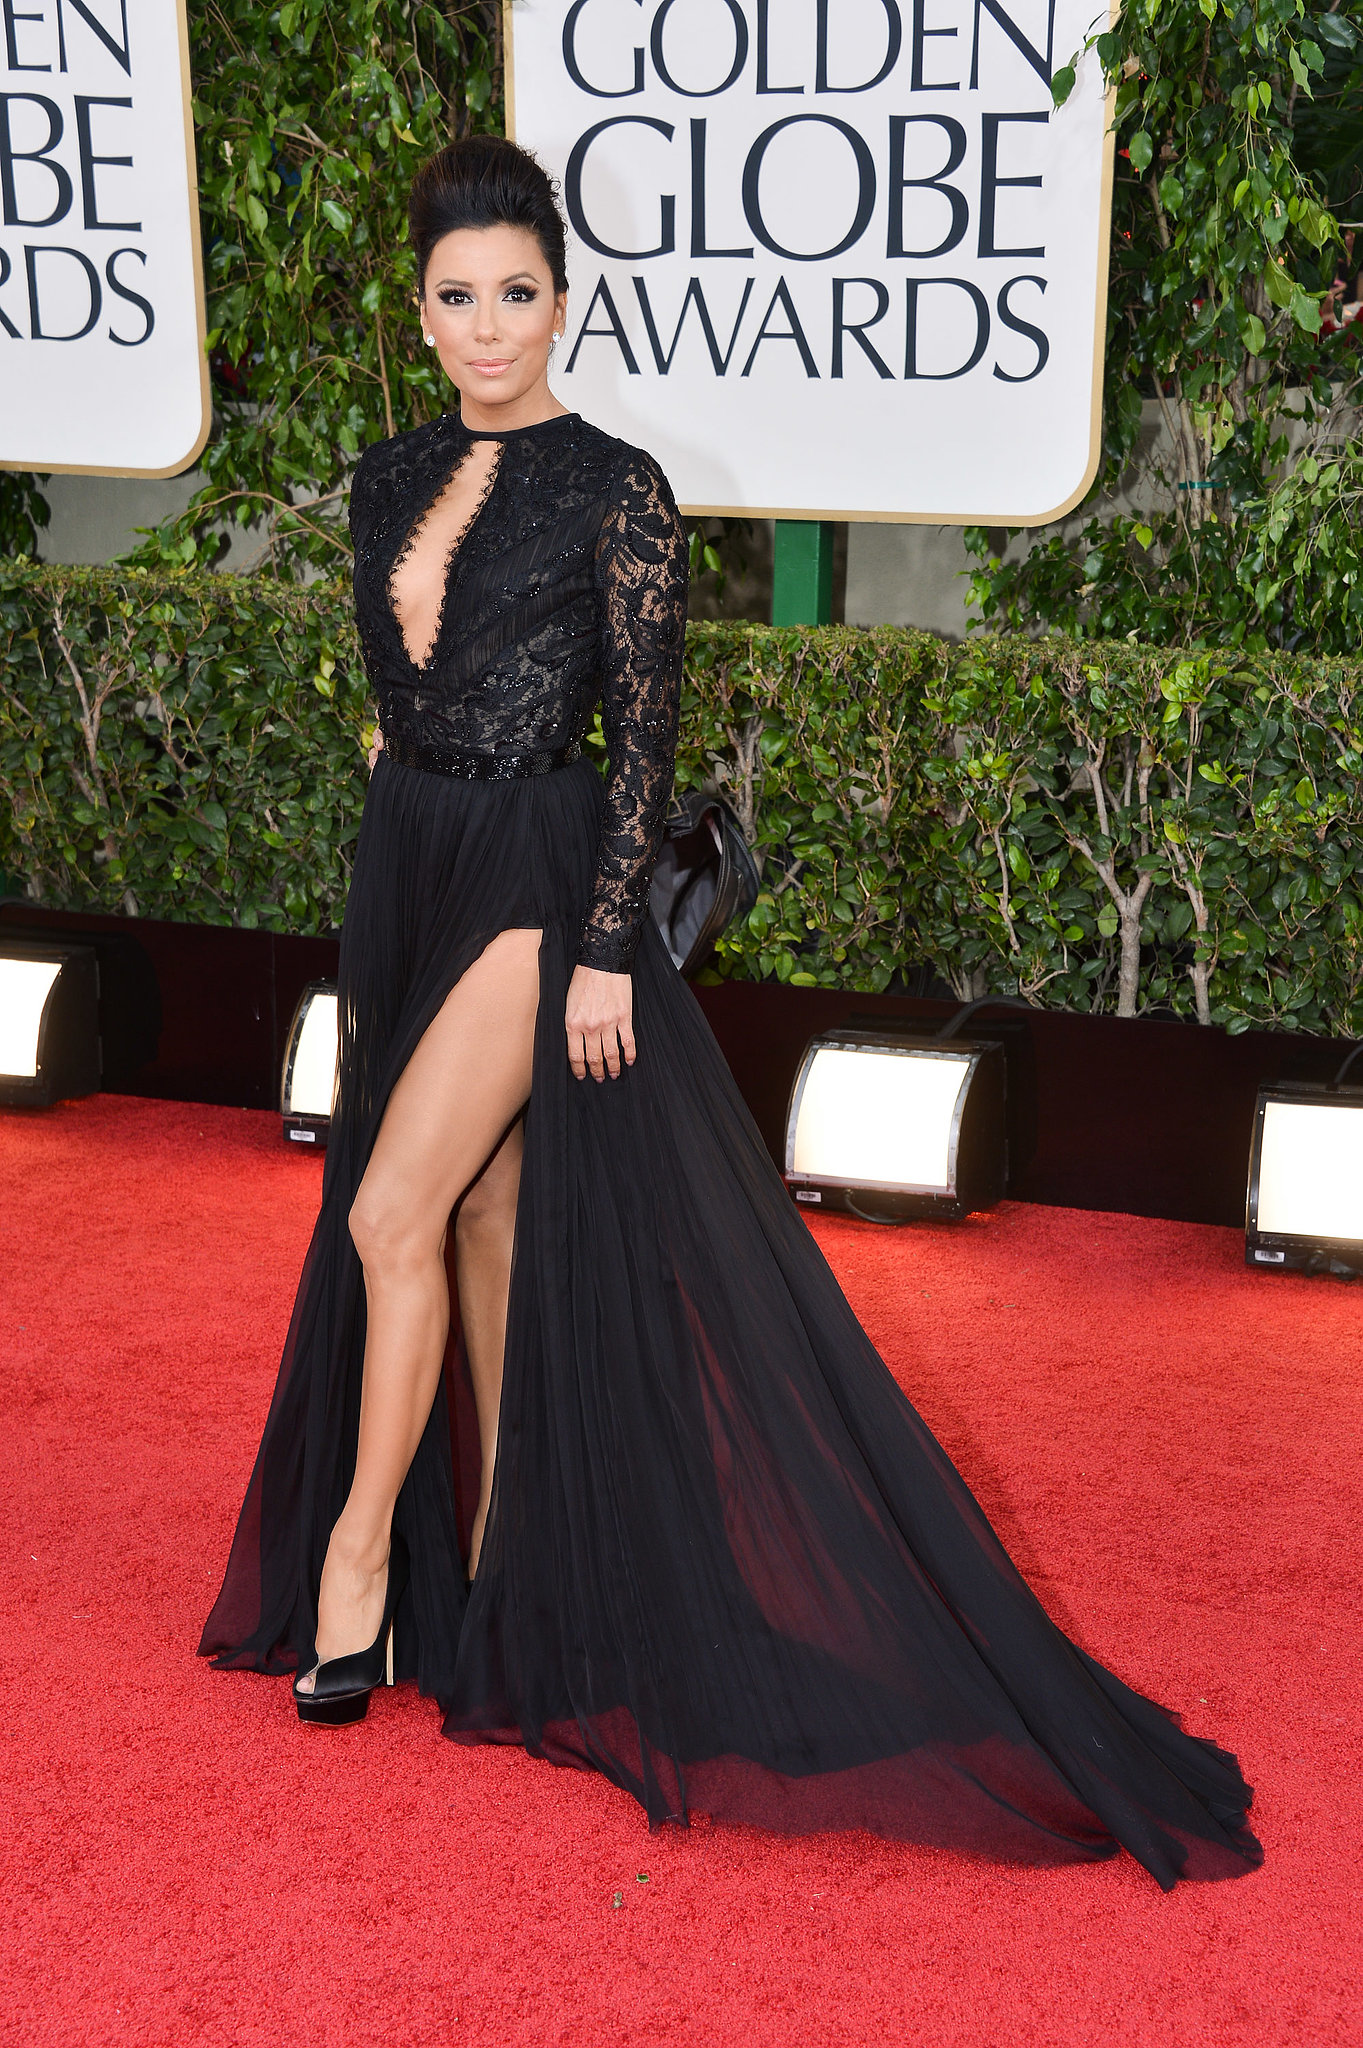 Eva Longoria at the Golden Globe Awards